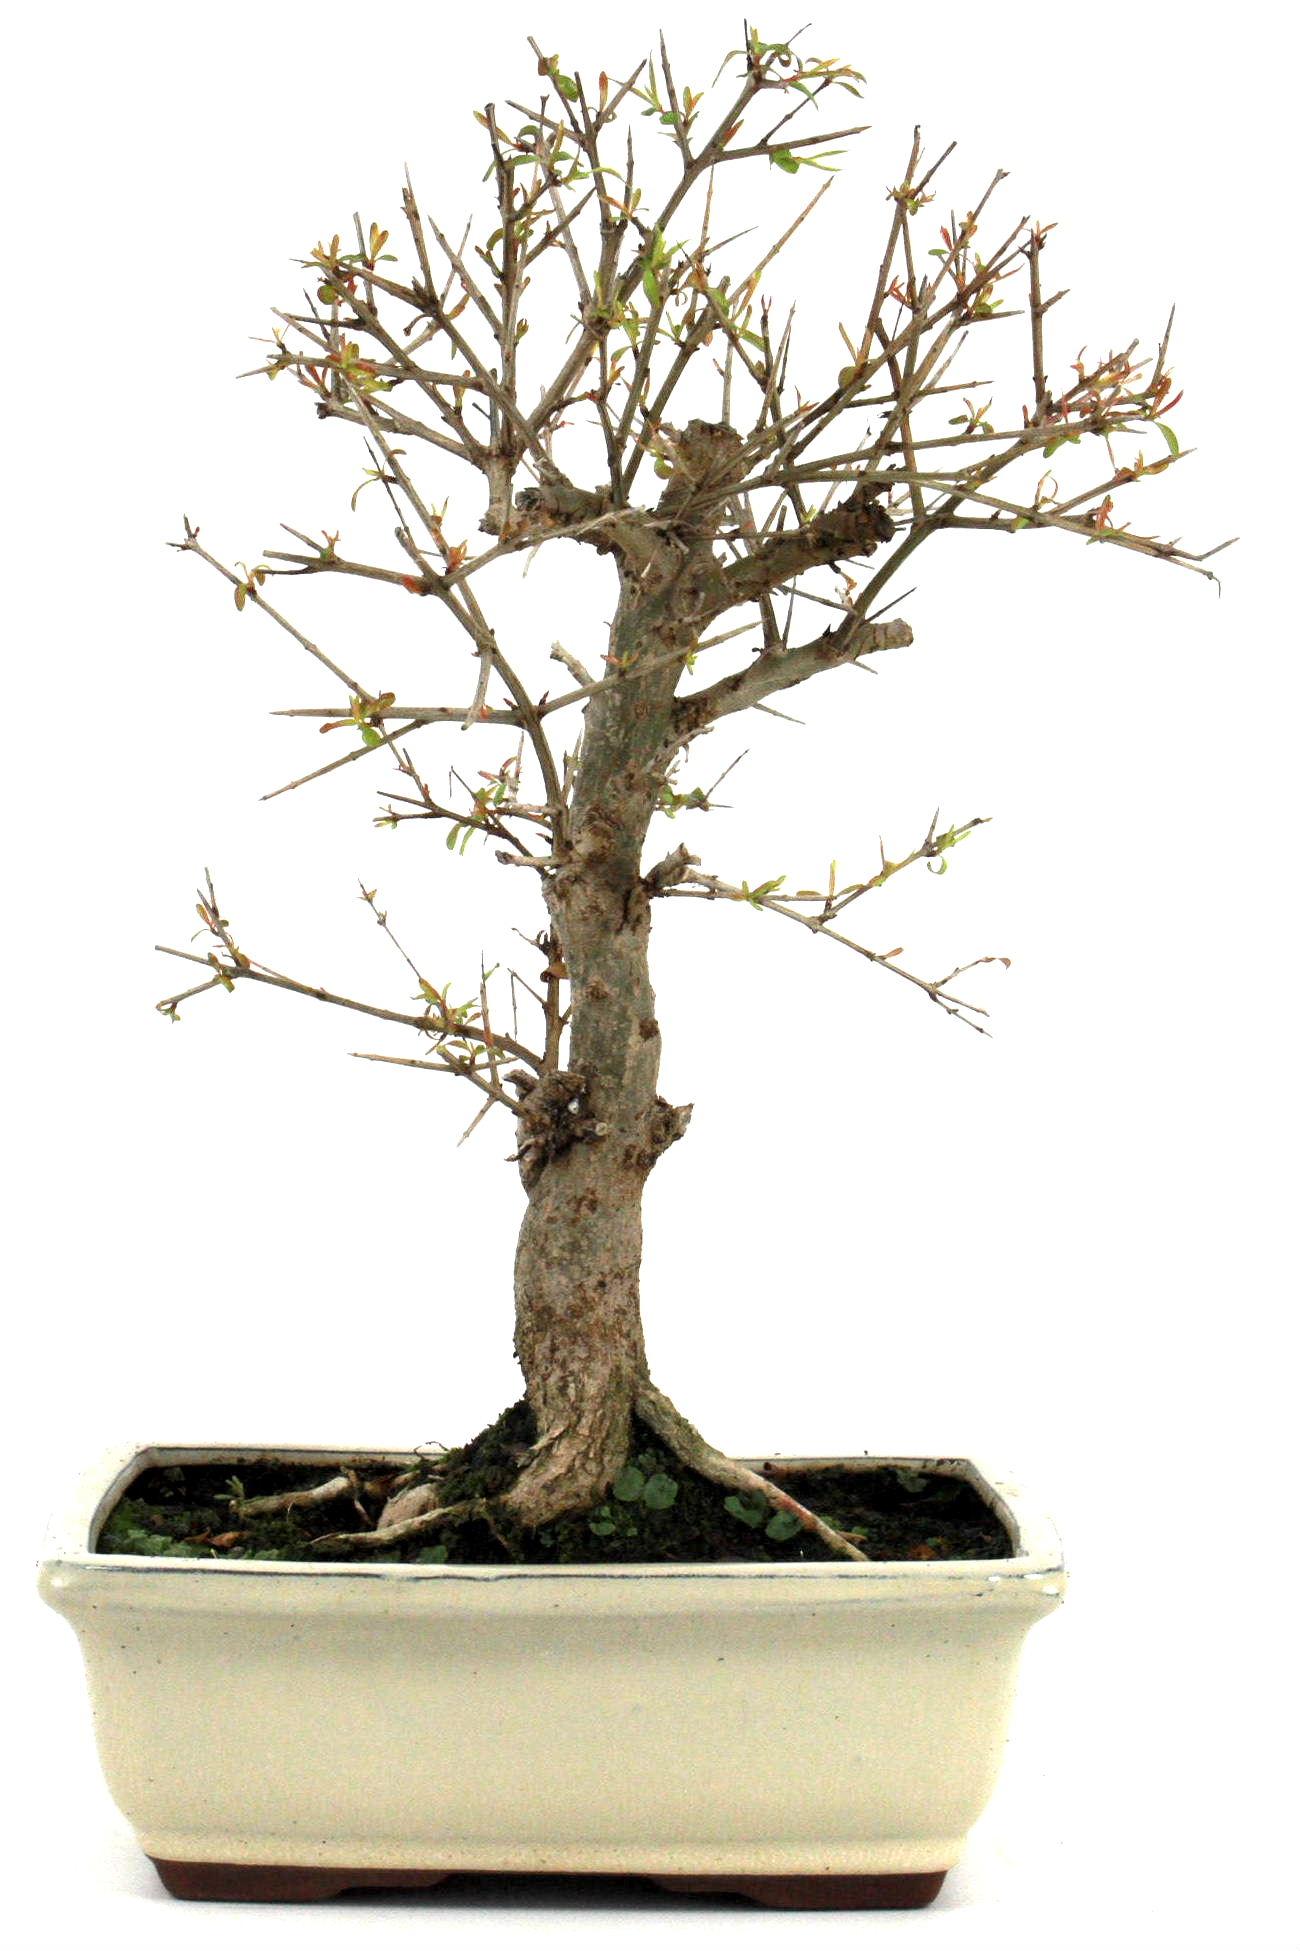 bonsai granatapfel 35 40 cm 197 bei oyaki bonsai kaufen. Black Bedroom Furniture Sets. Home Design Ideas